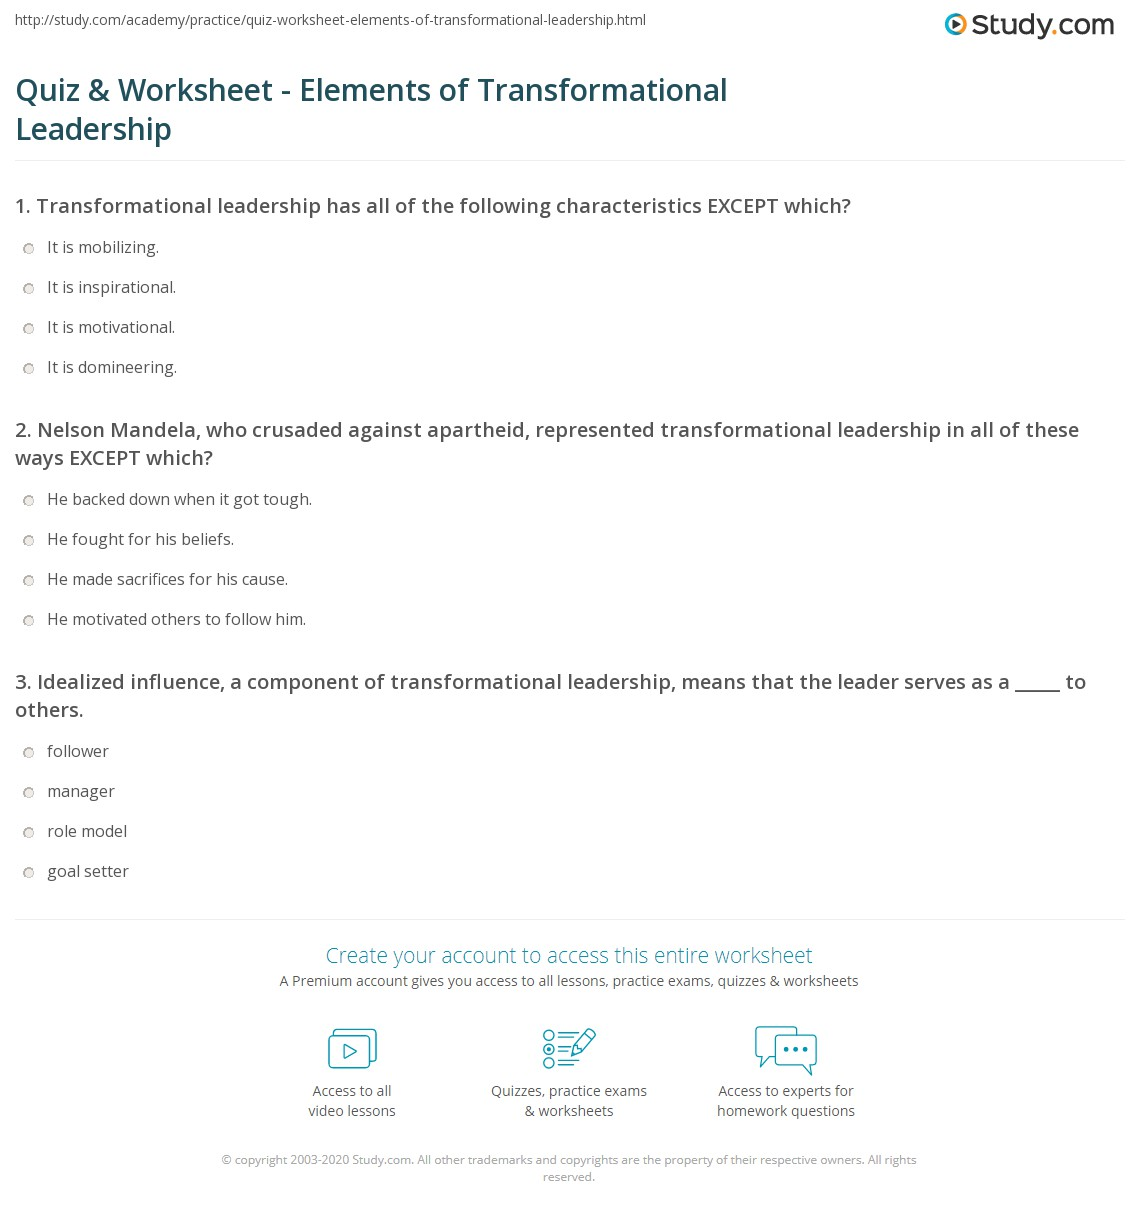 quiz & worksheet - elements of transformational leadership | study